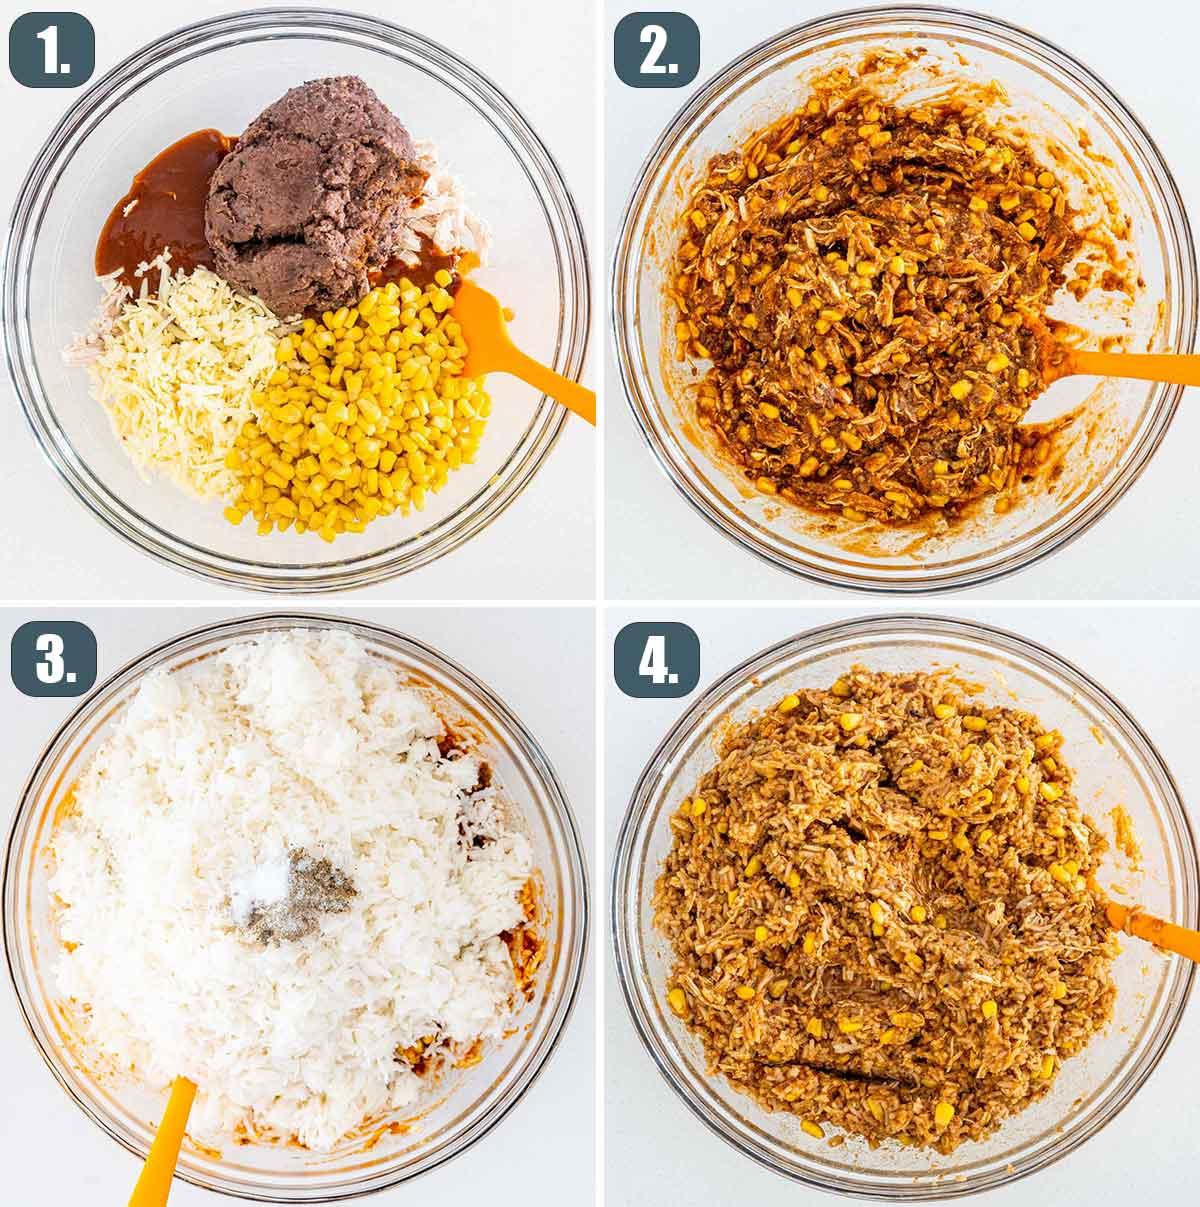 process shots showing how to make chicken enchilada casserole.